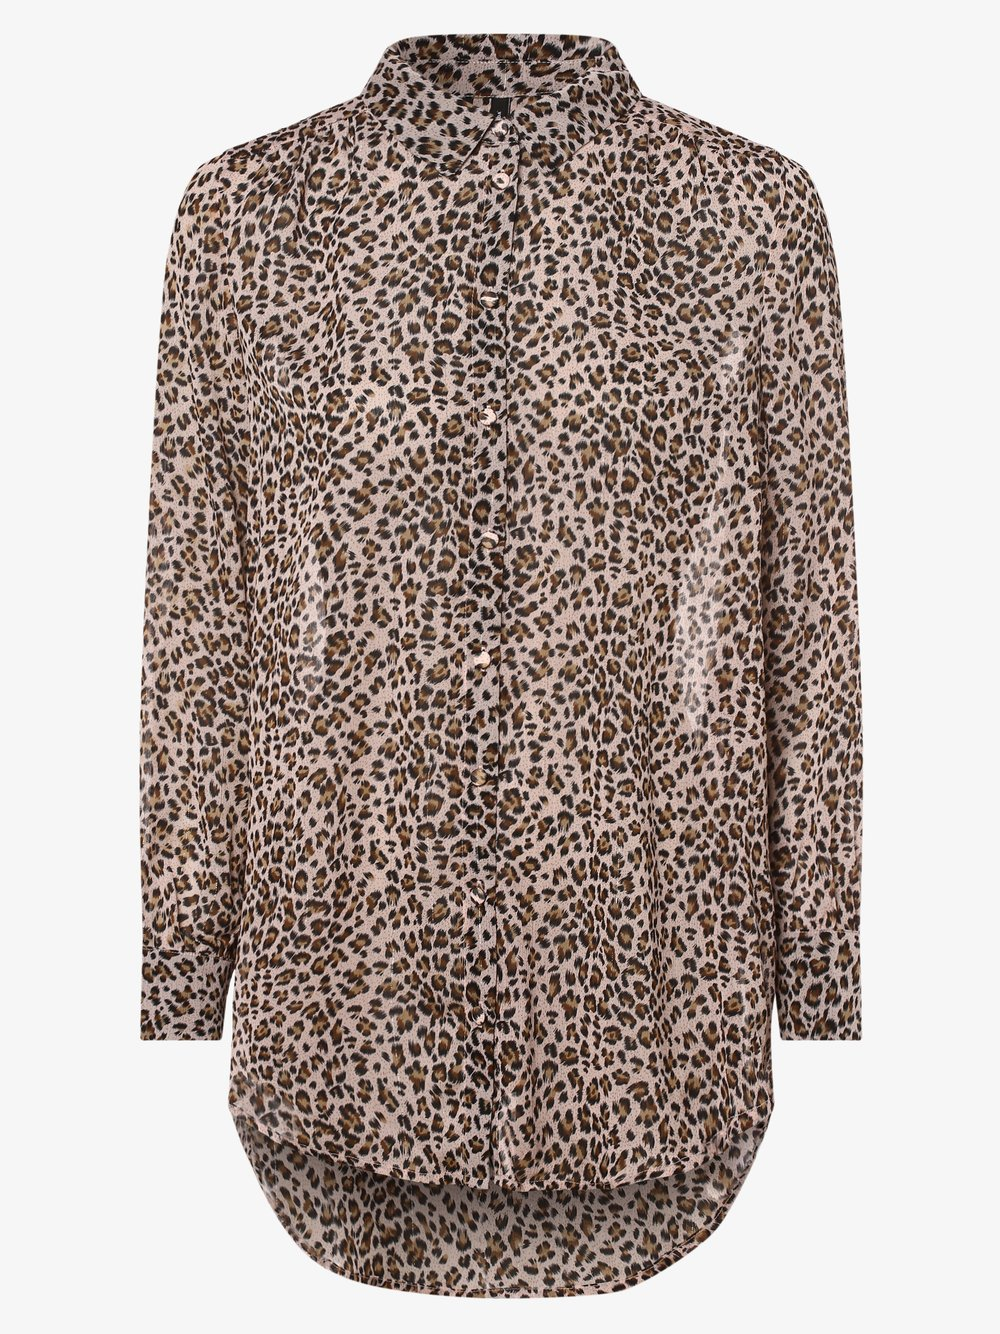 Vero Moda – Bluzka damska – Vmbea, różowy Van Graaf 466470-0001-09960